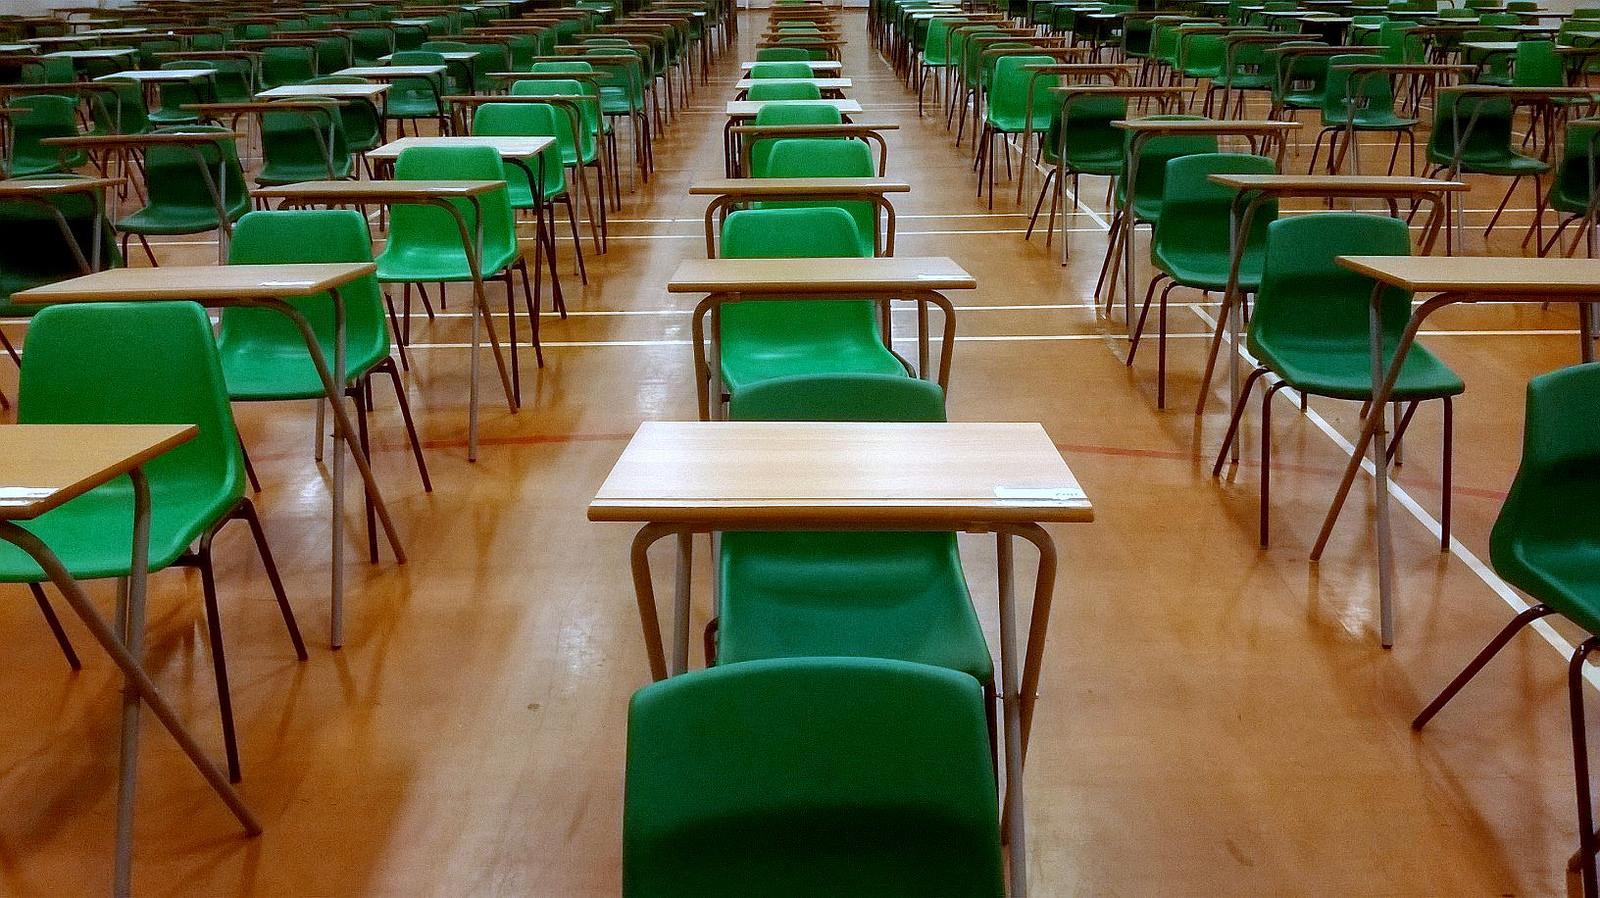 Ready For The CFA Exam?